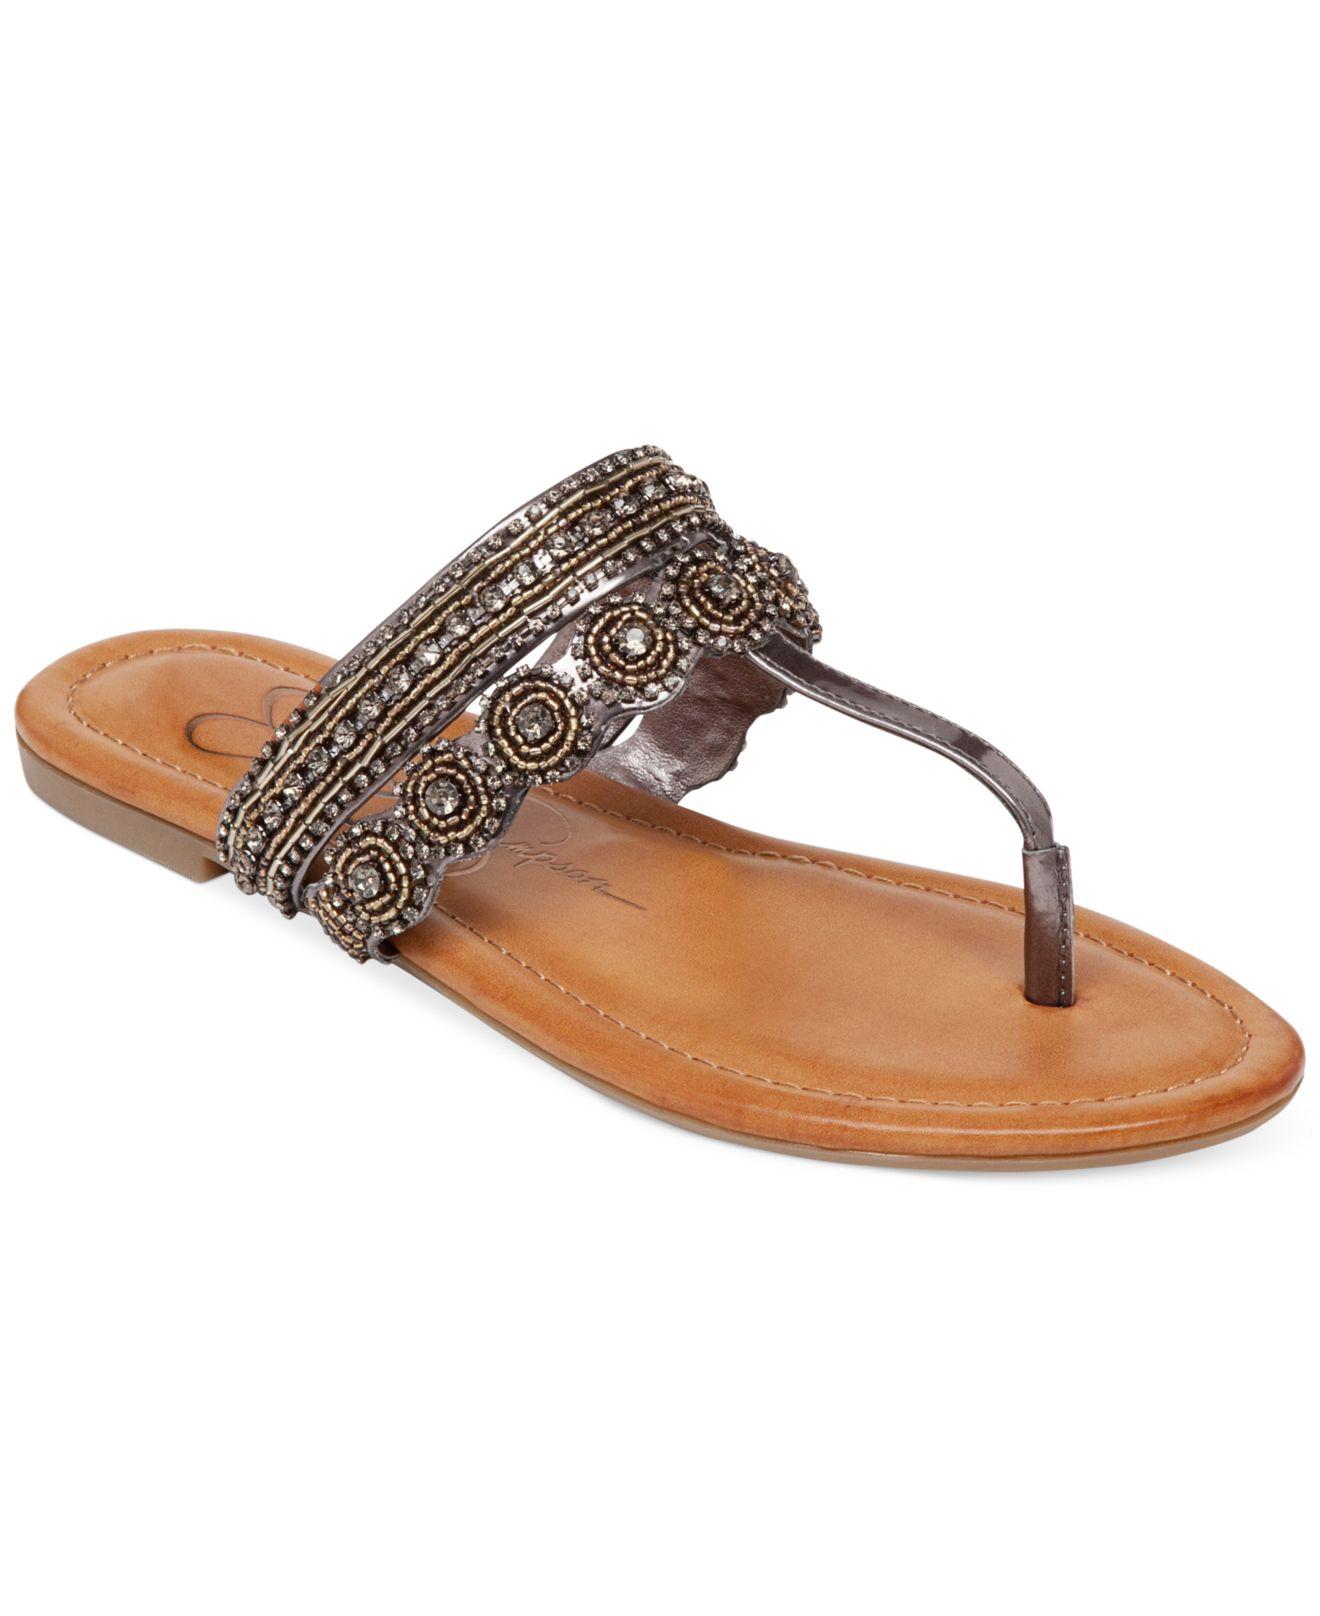 347eadb0ba863 Lyst - Jessica Simpson Roelle Flat Thong Sandals in Metallic